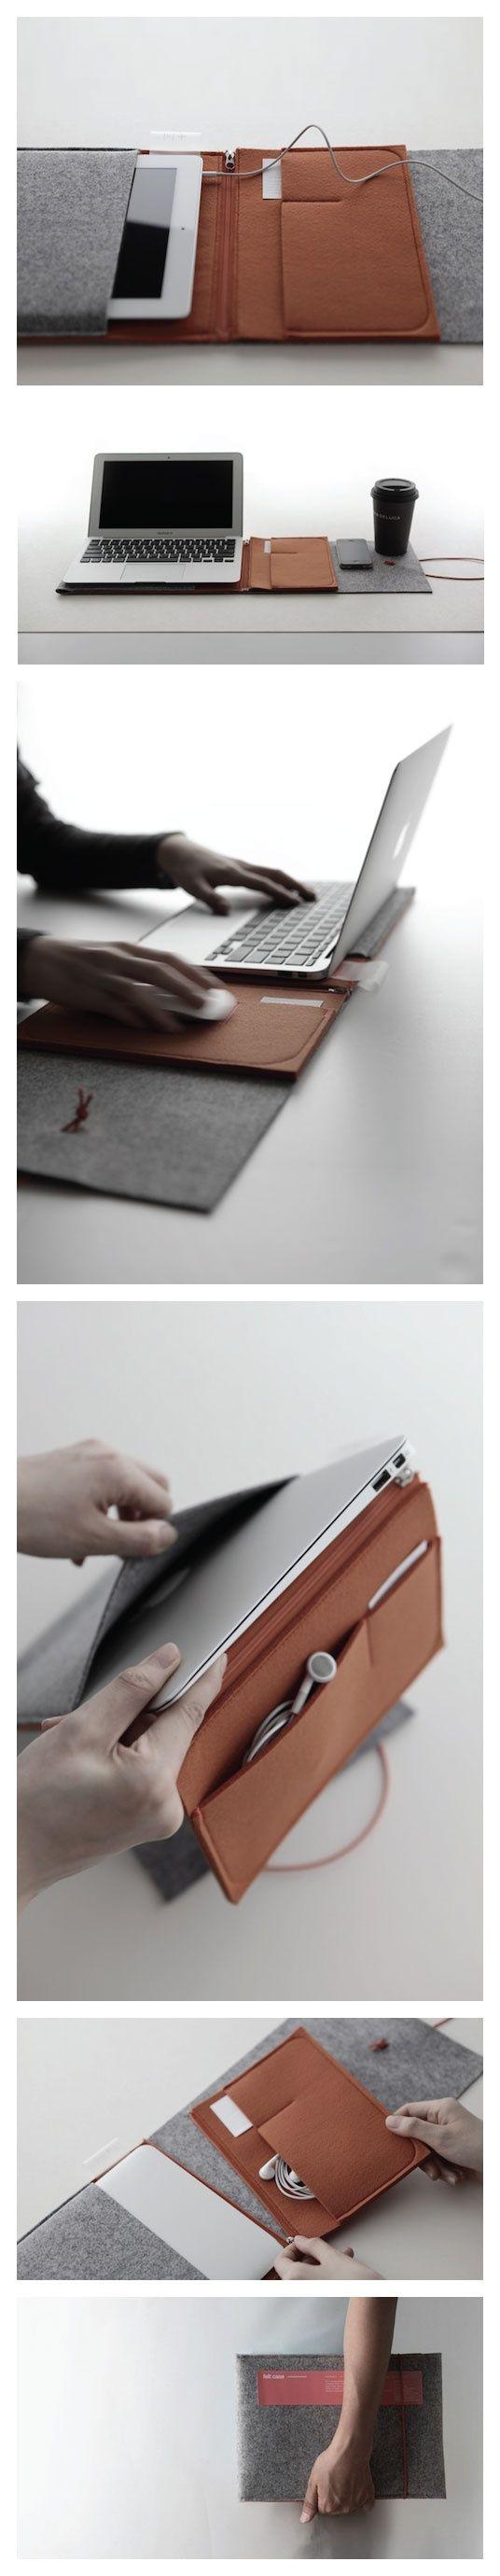 Felt Case designed by Cloud&Co for 11+